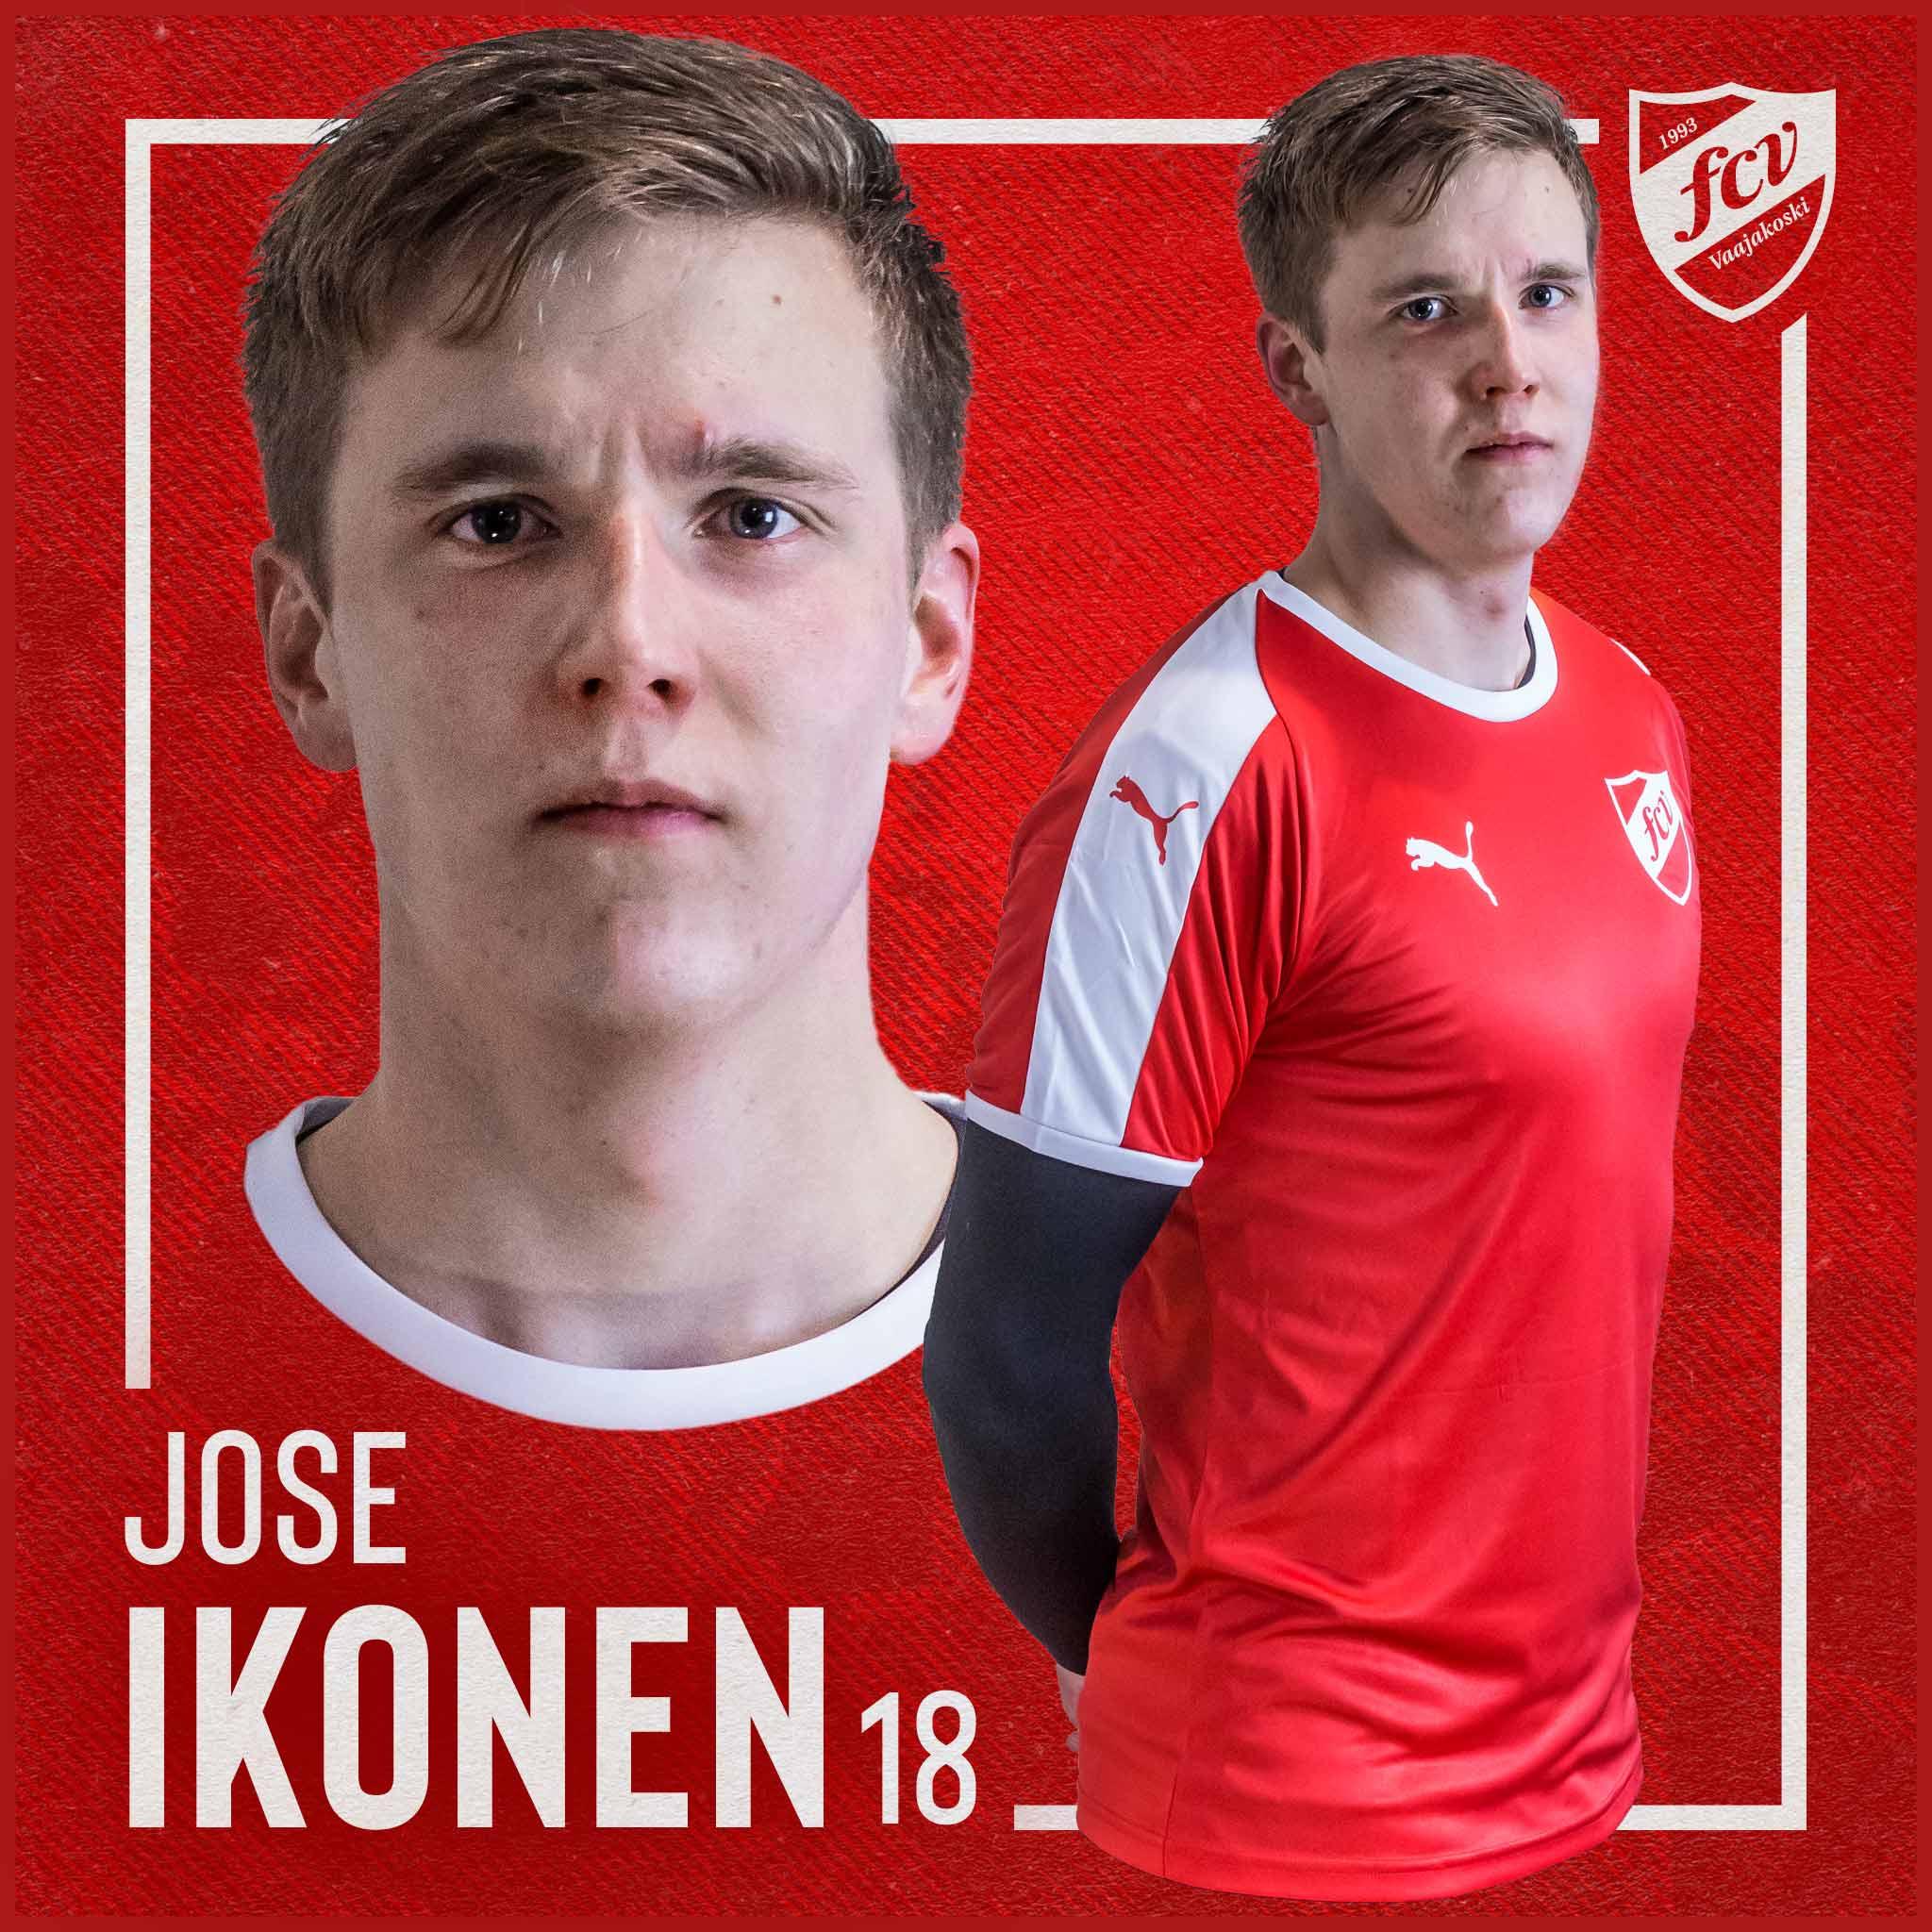 Jose Ikonen